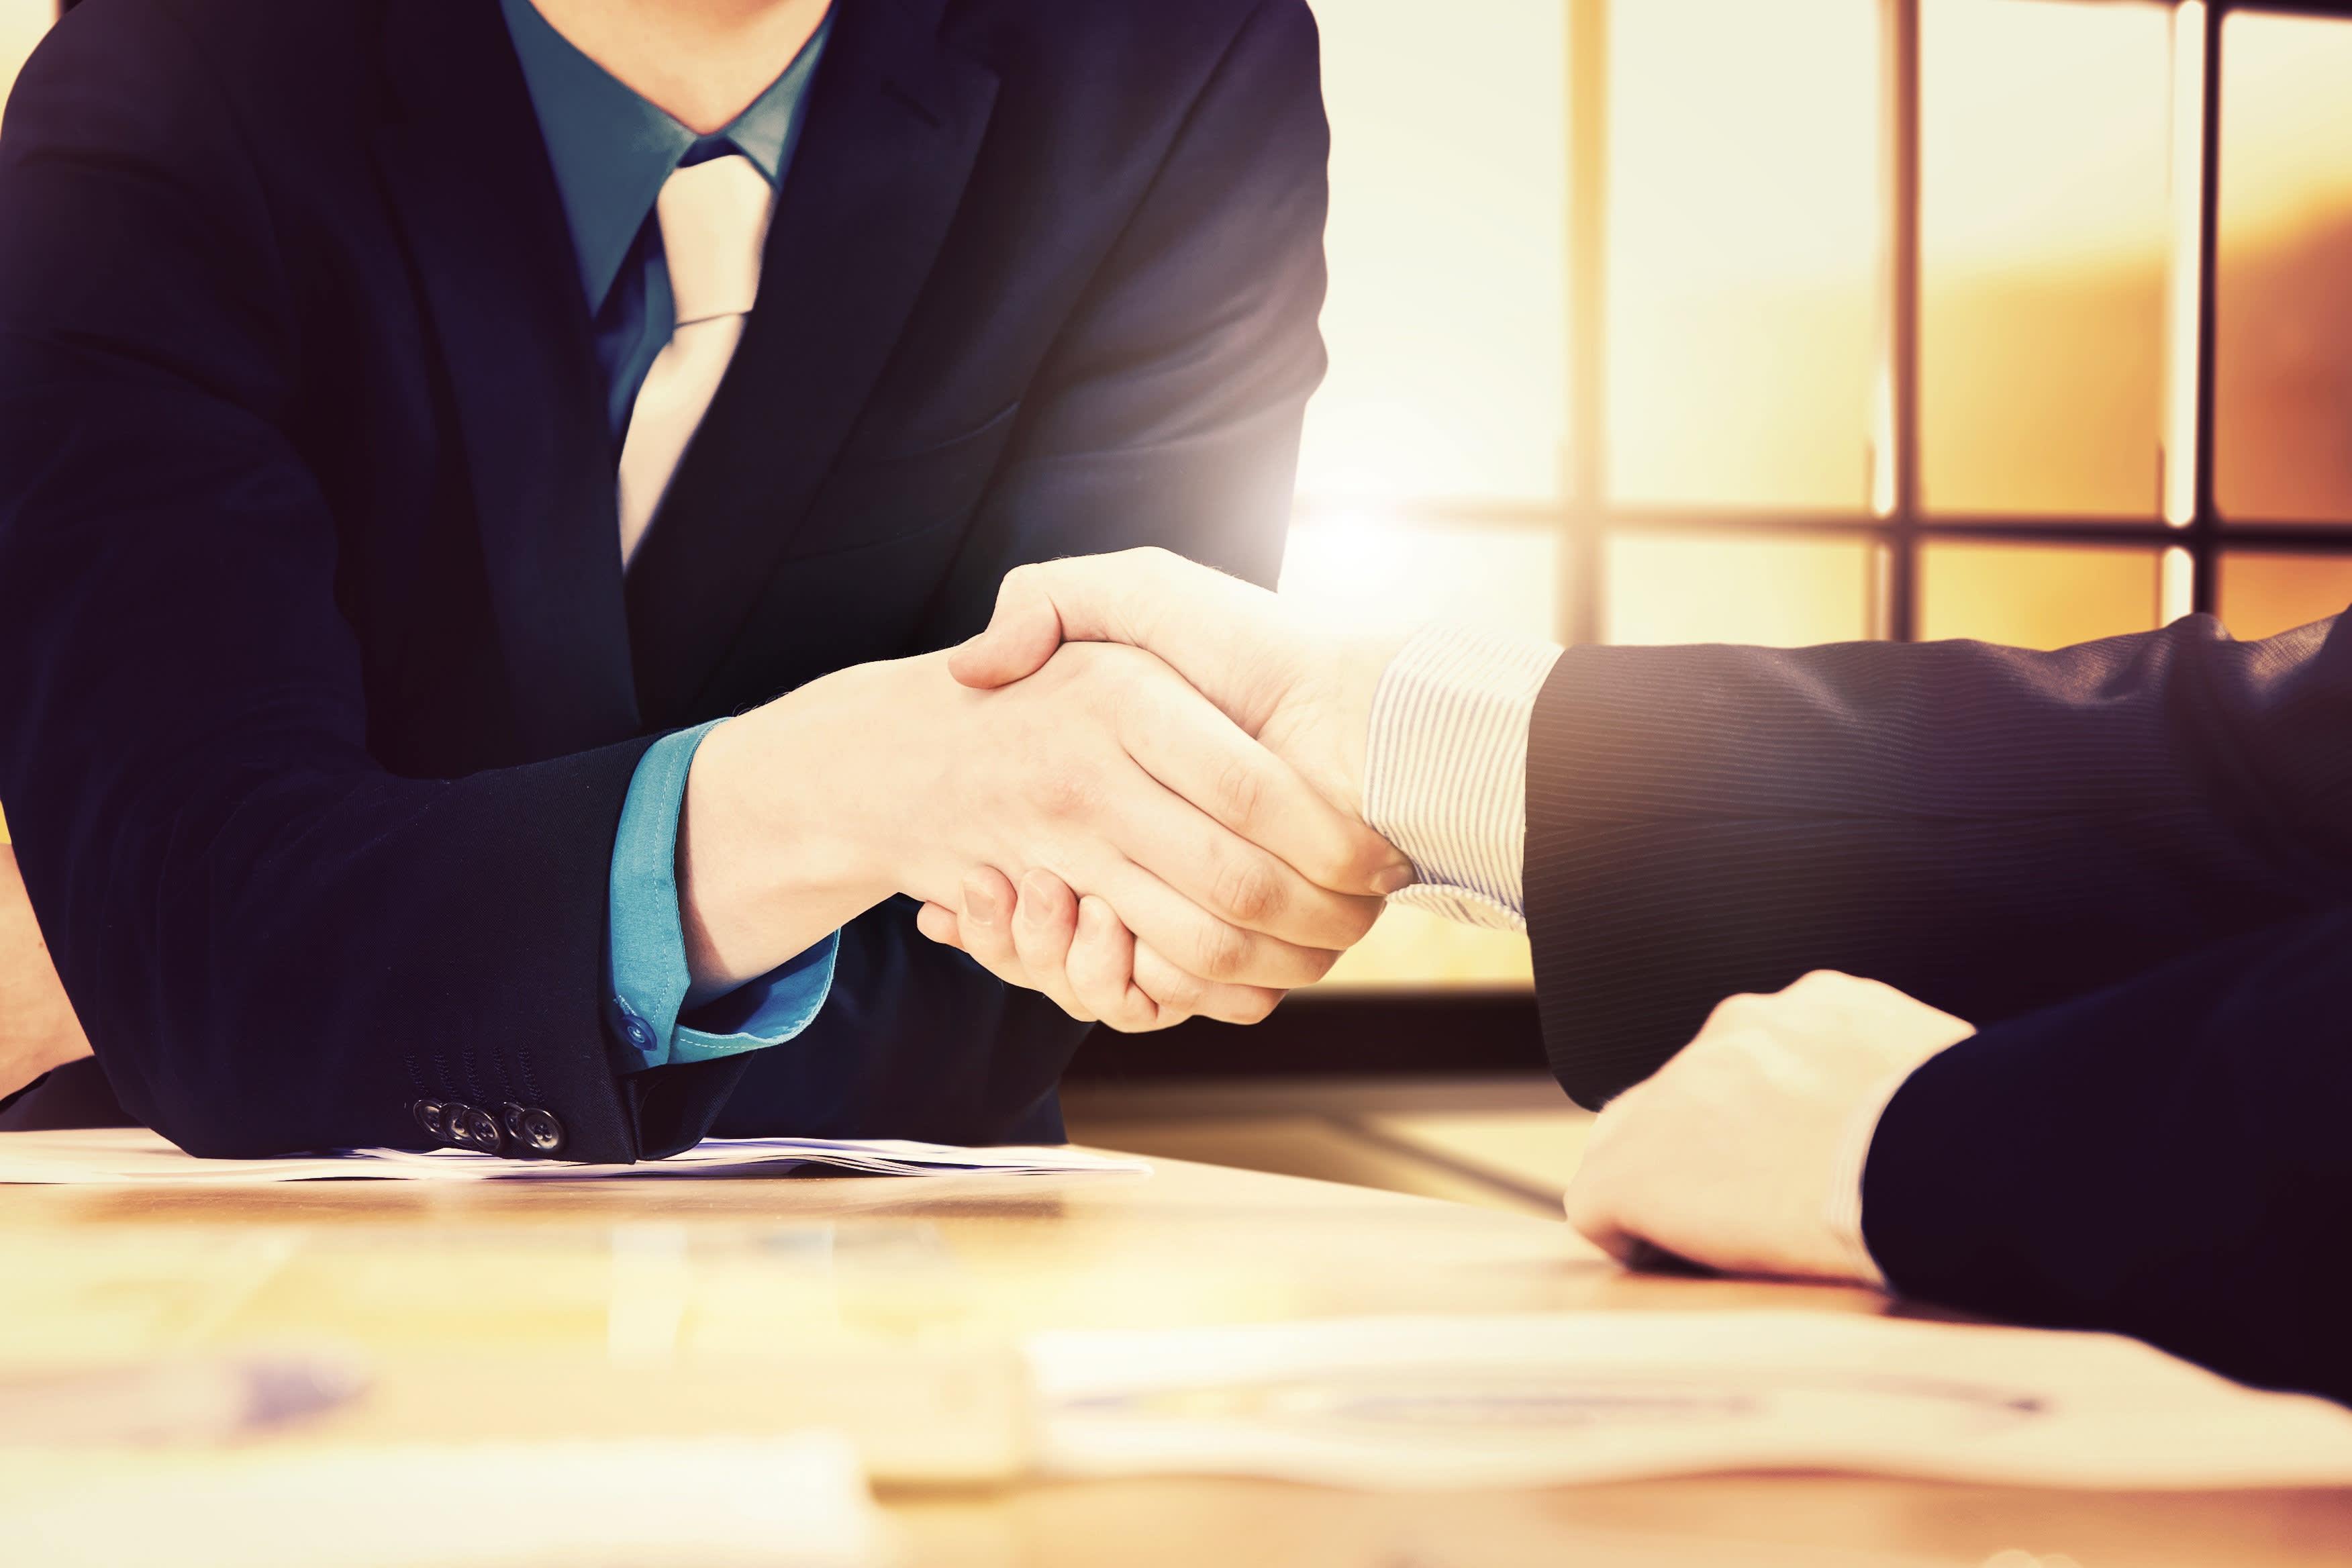 Ex-Standard Life head of adviser relationships joins Sesame